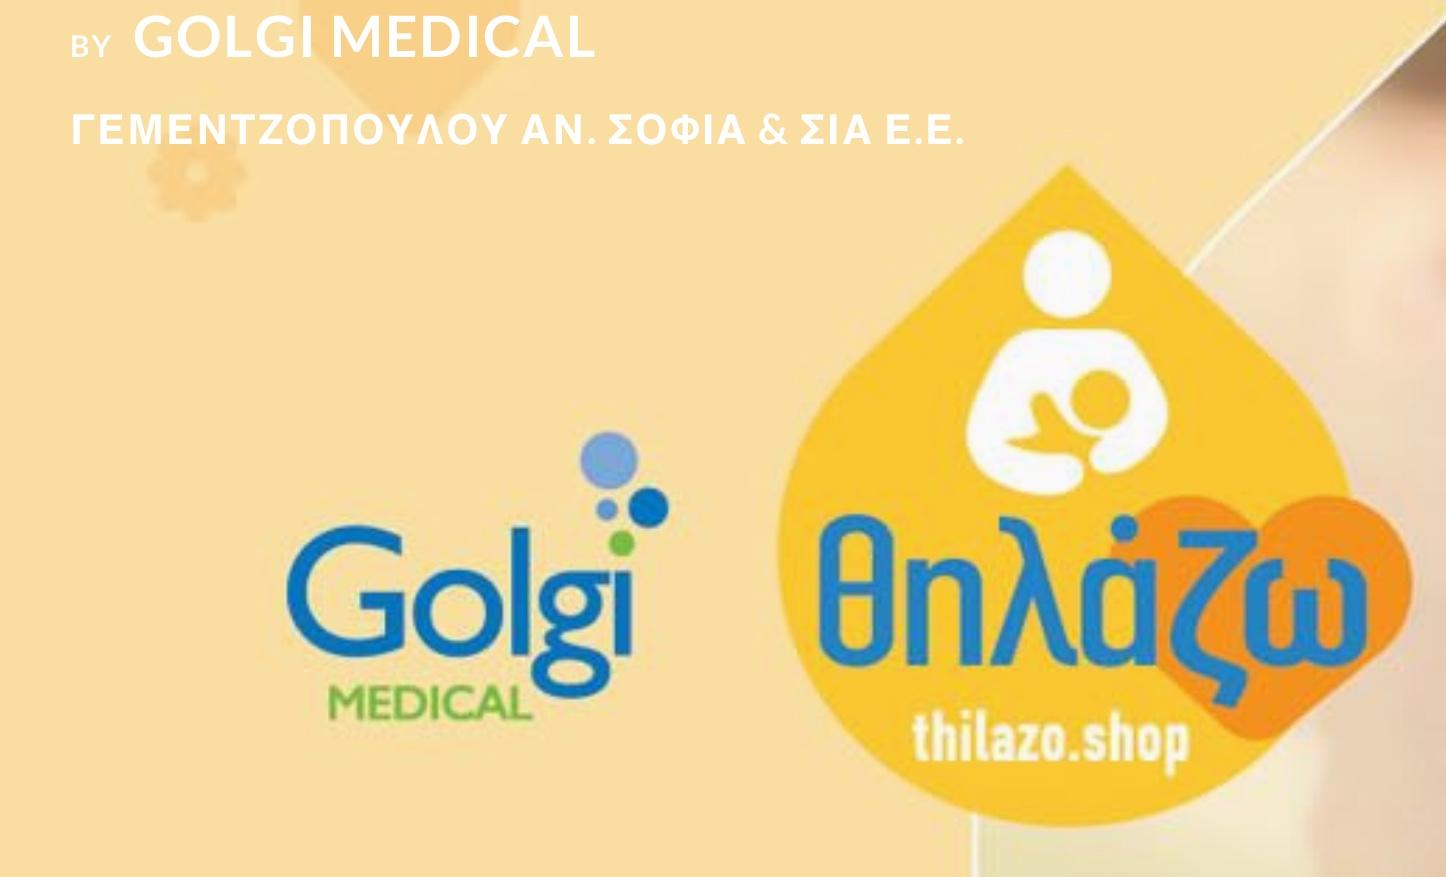 b0f3070a23a Σημεία φιλικά για τον θηλασμό σε όλη την Ελλάδα - Αλκυόνη